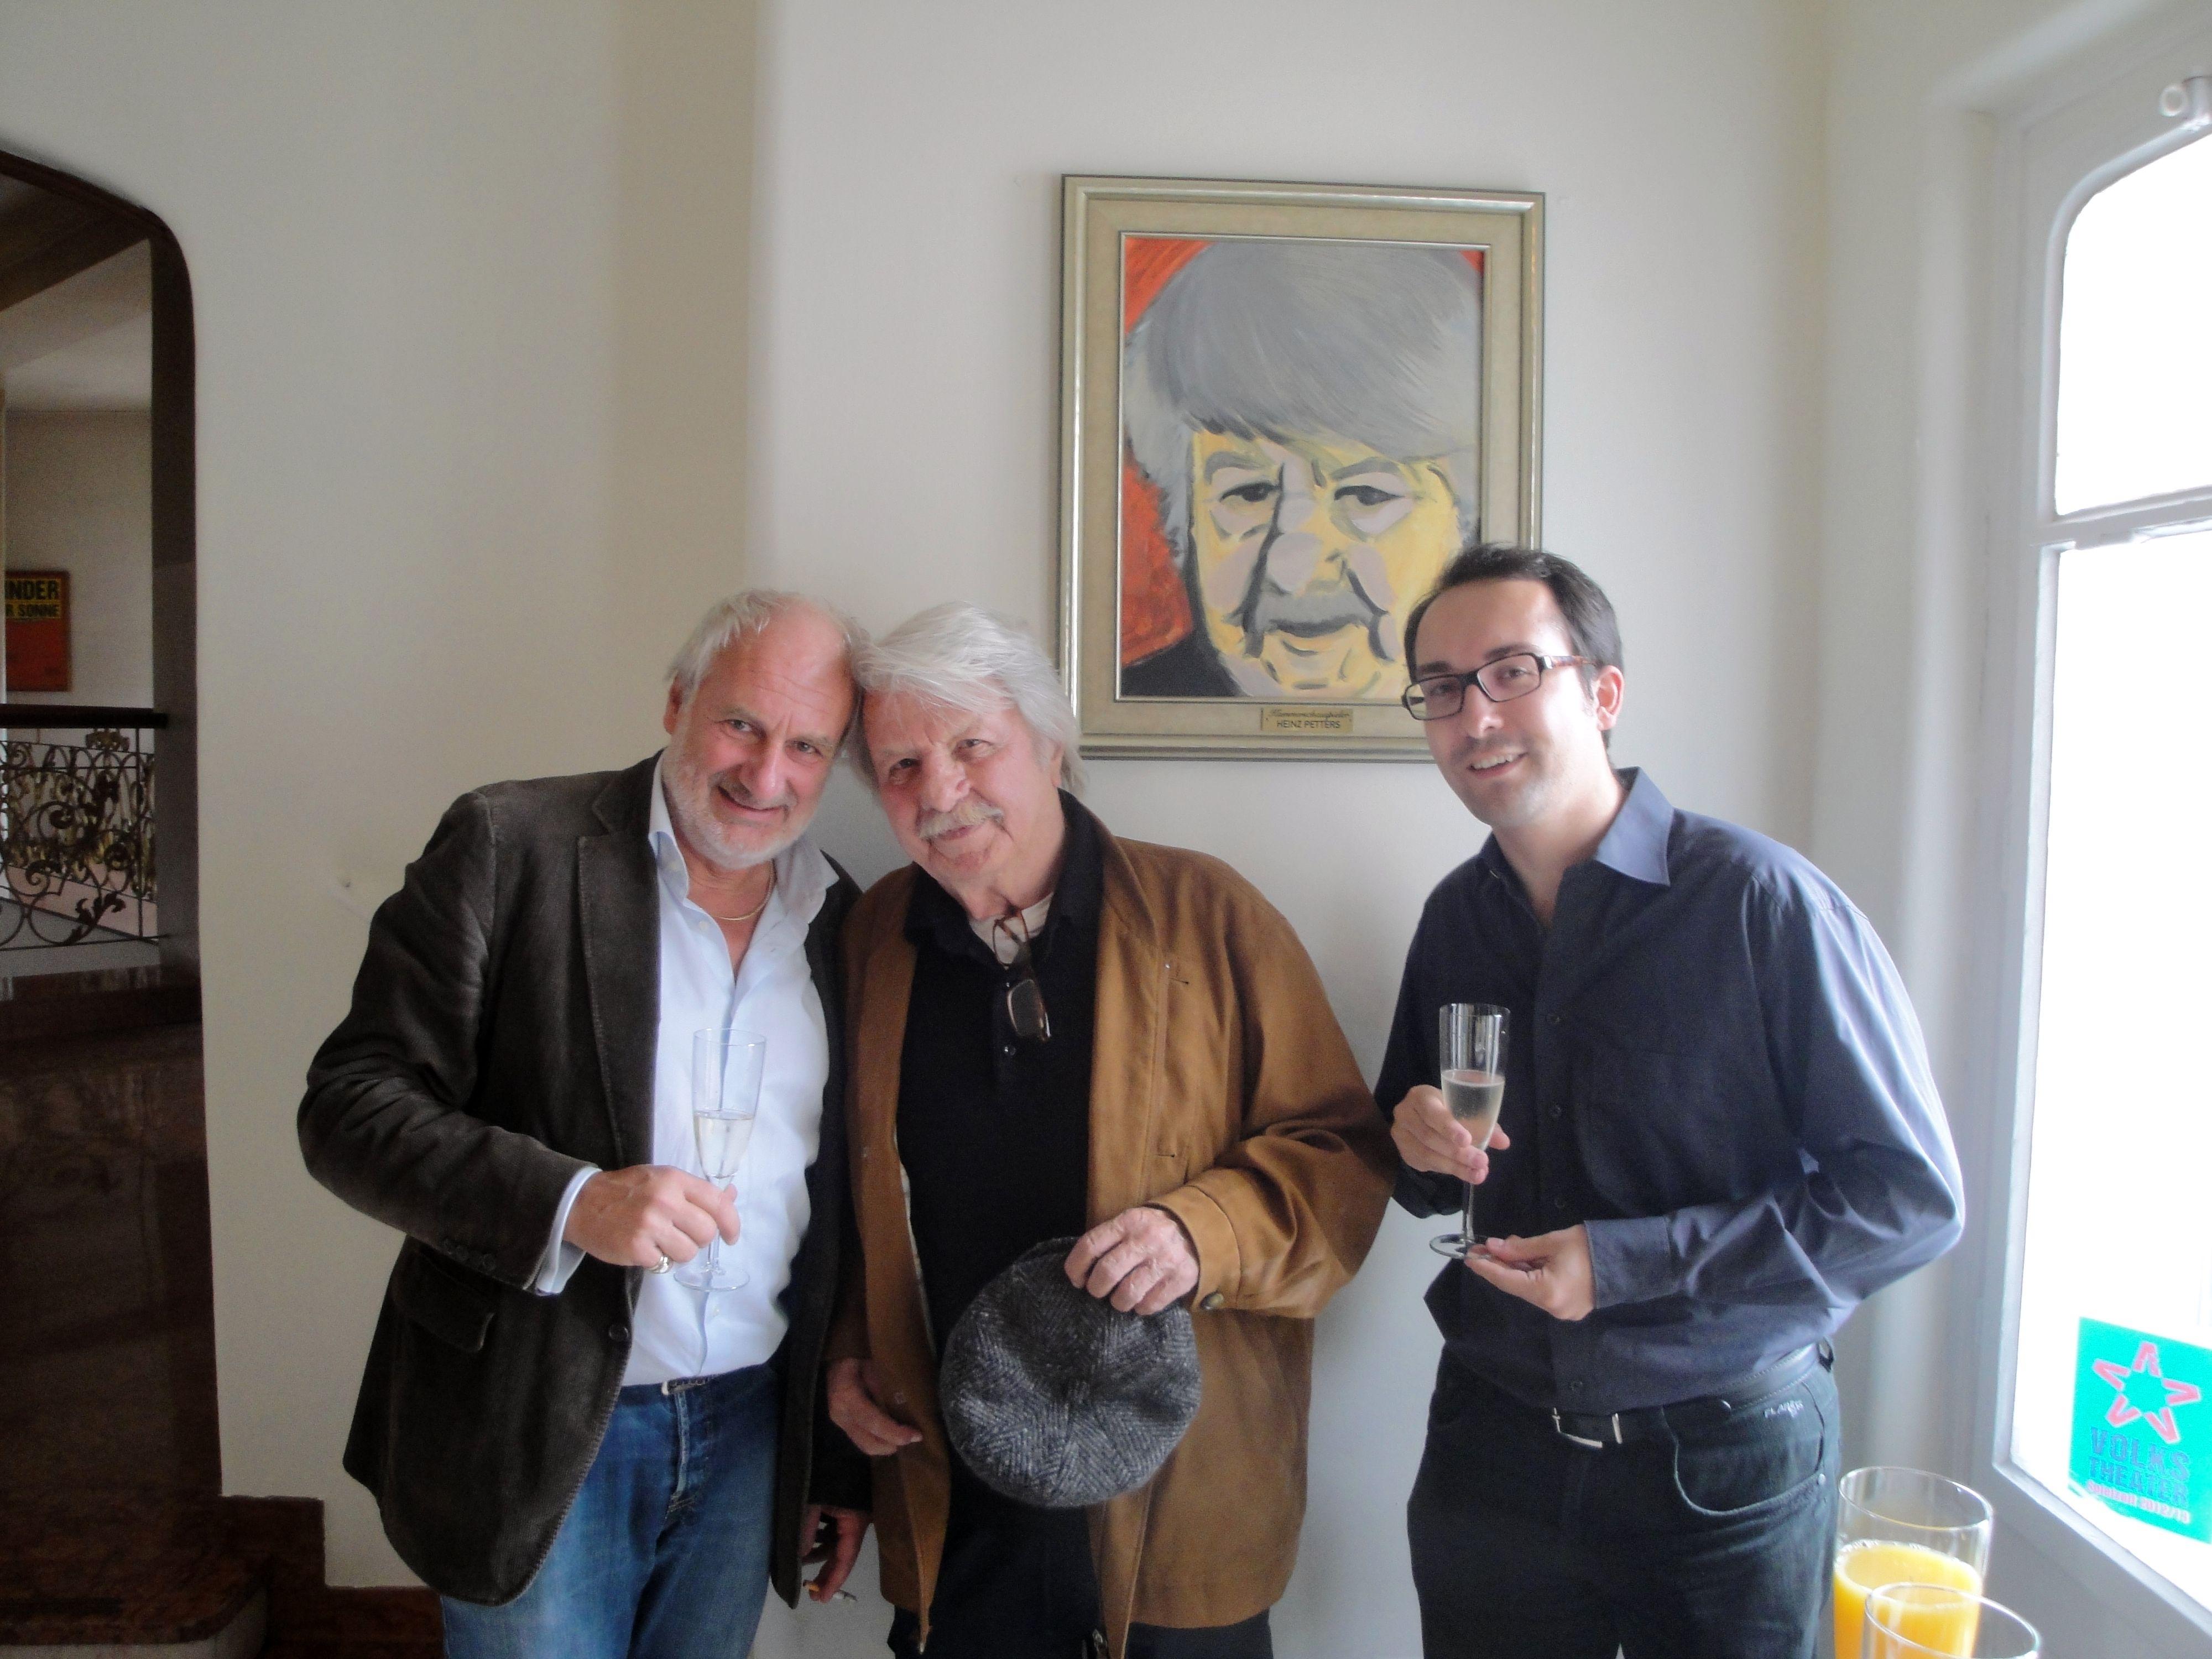 Michael Schottenberg / Heinz Petters / Reinhard Trinkler